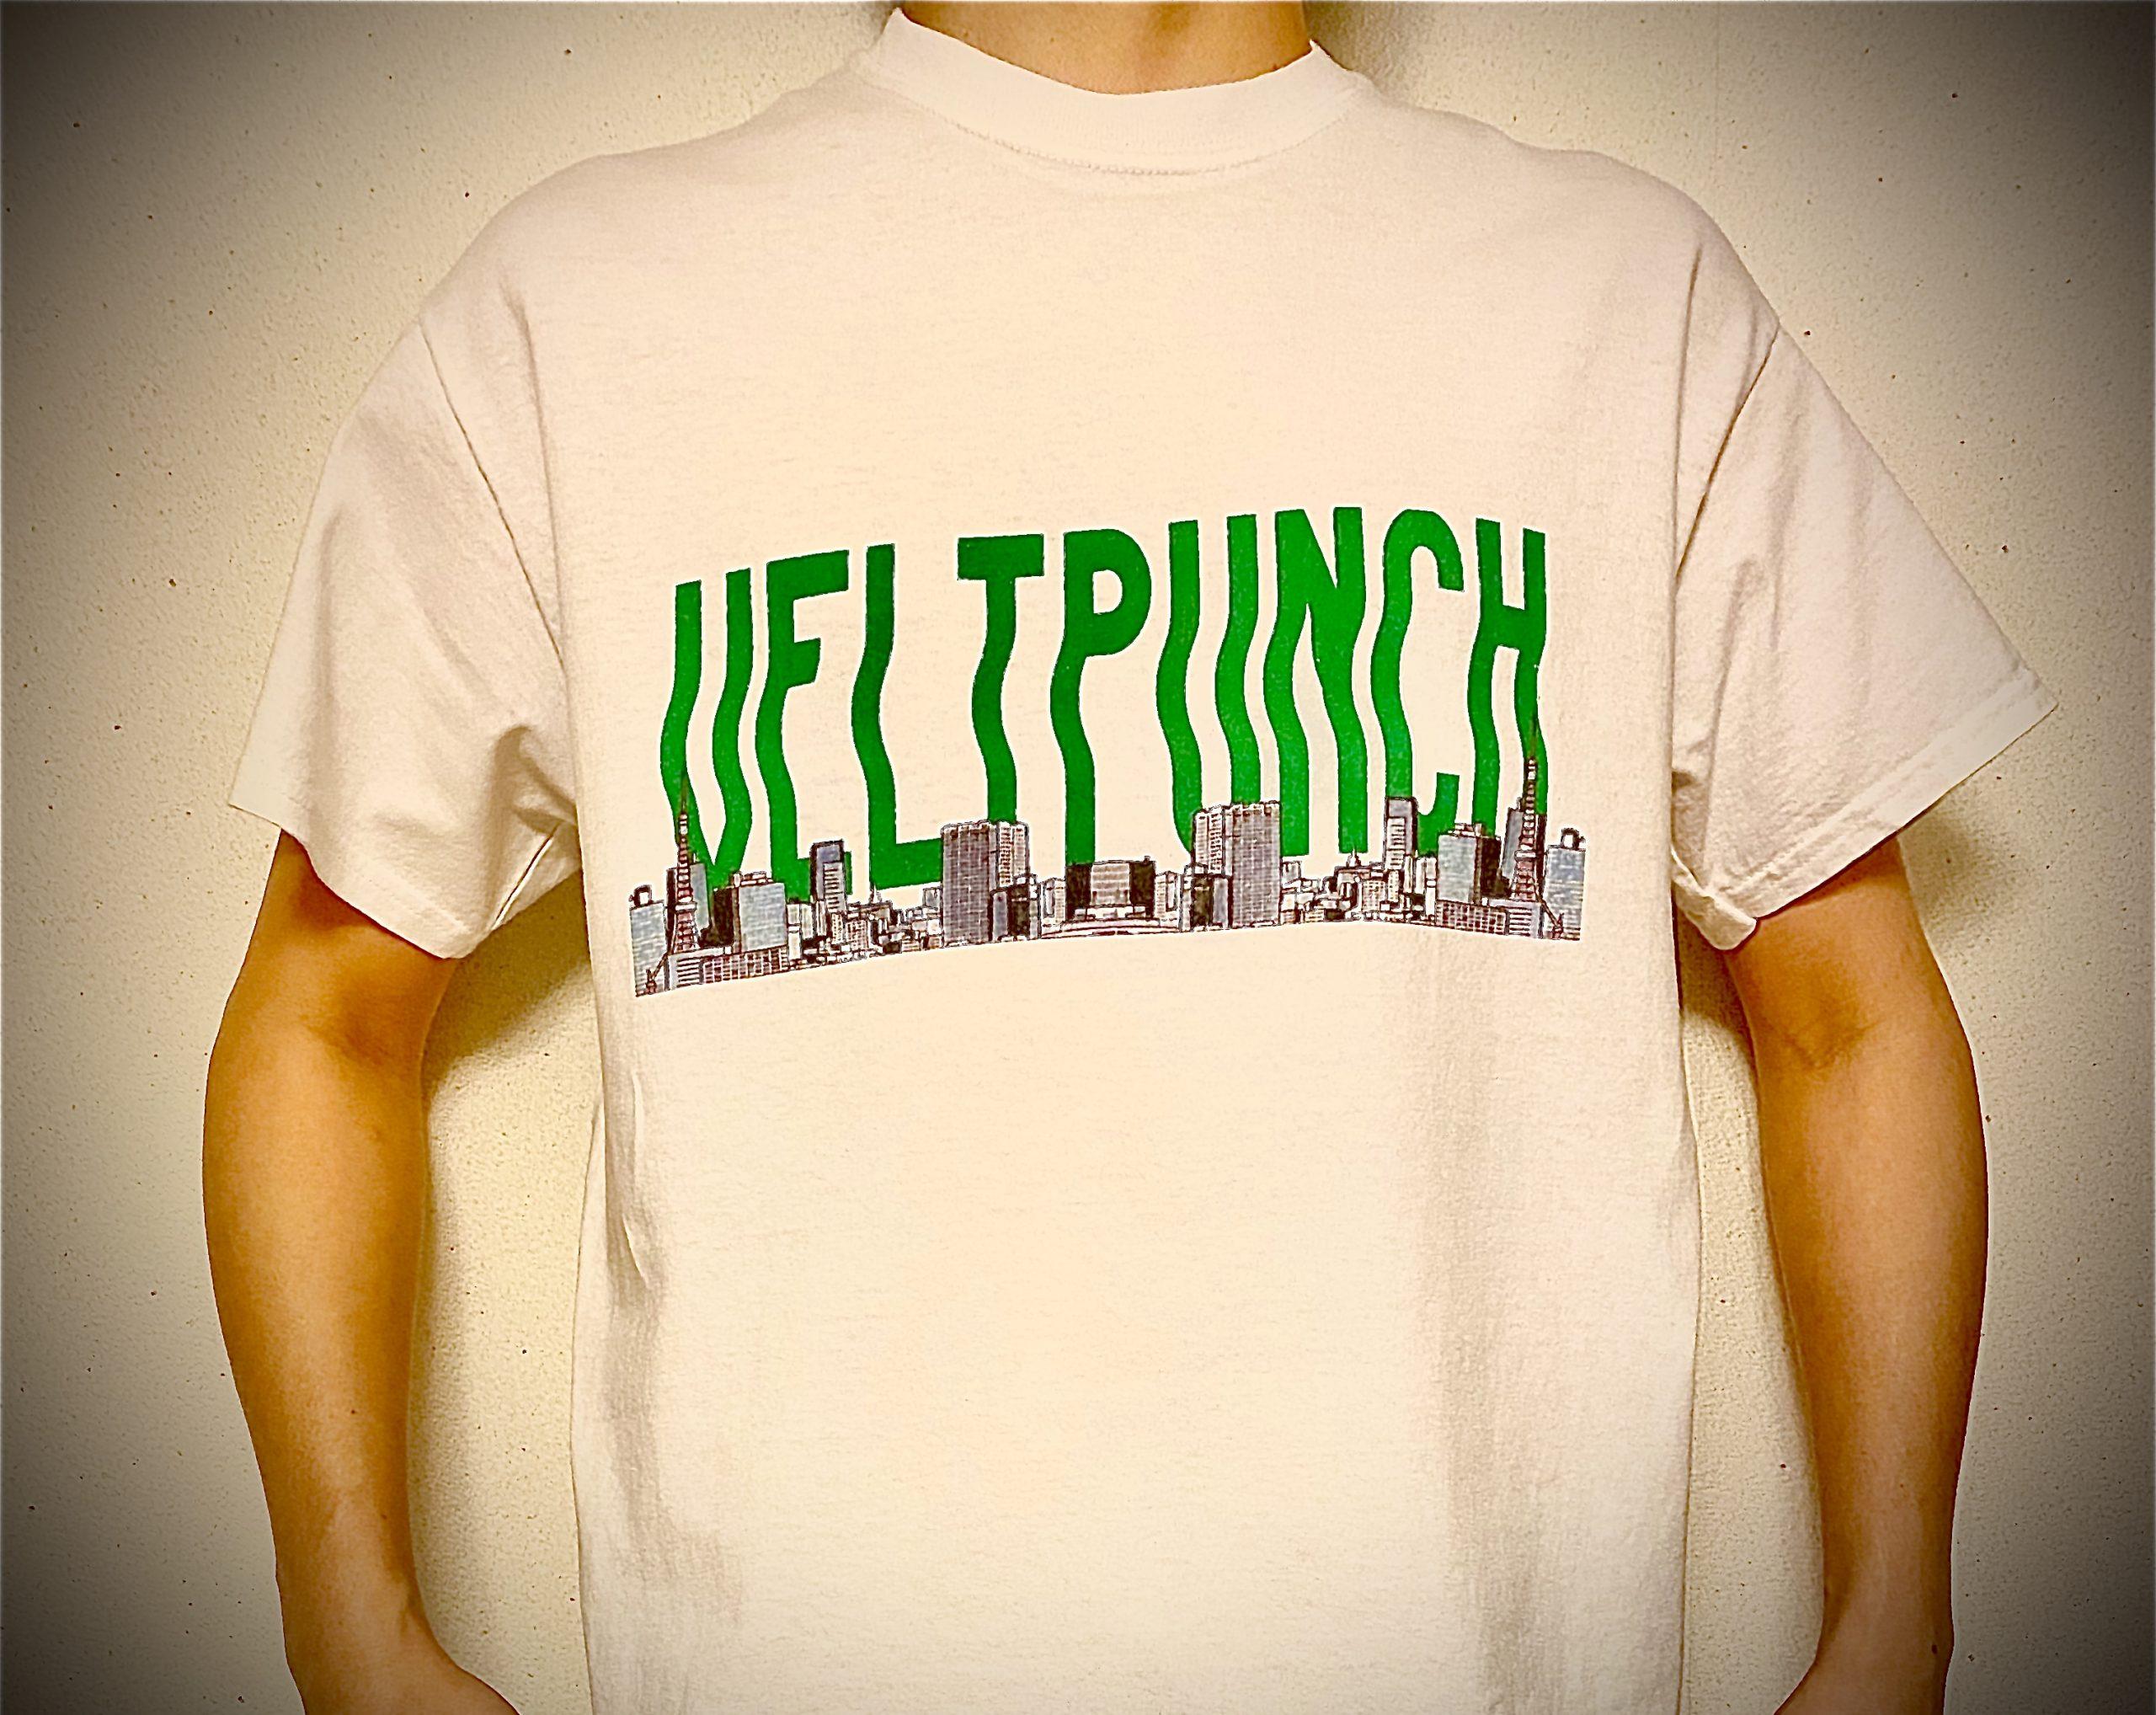 VELTPUNCH新デザインTシャツ受注開始のお知らせ